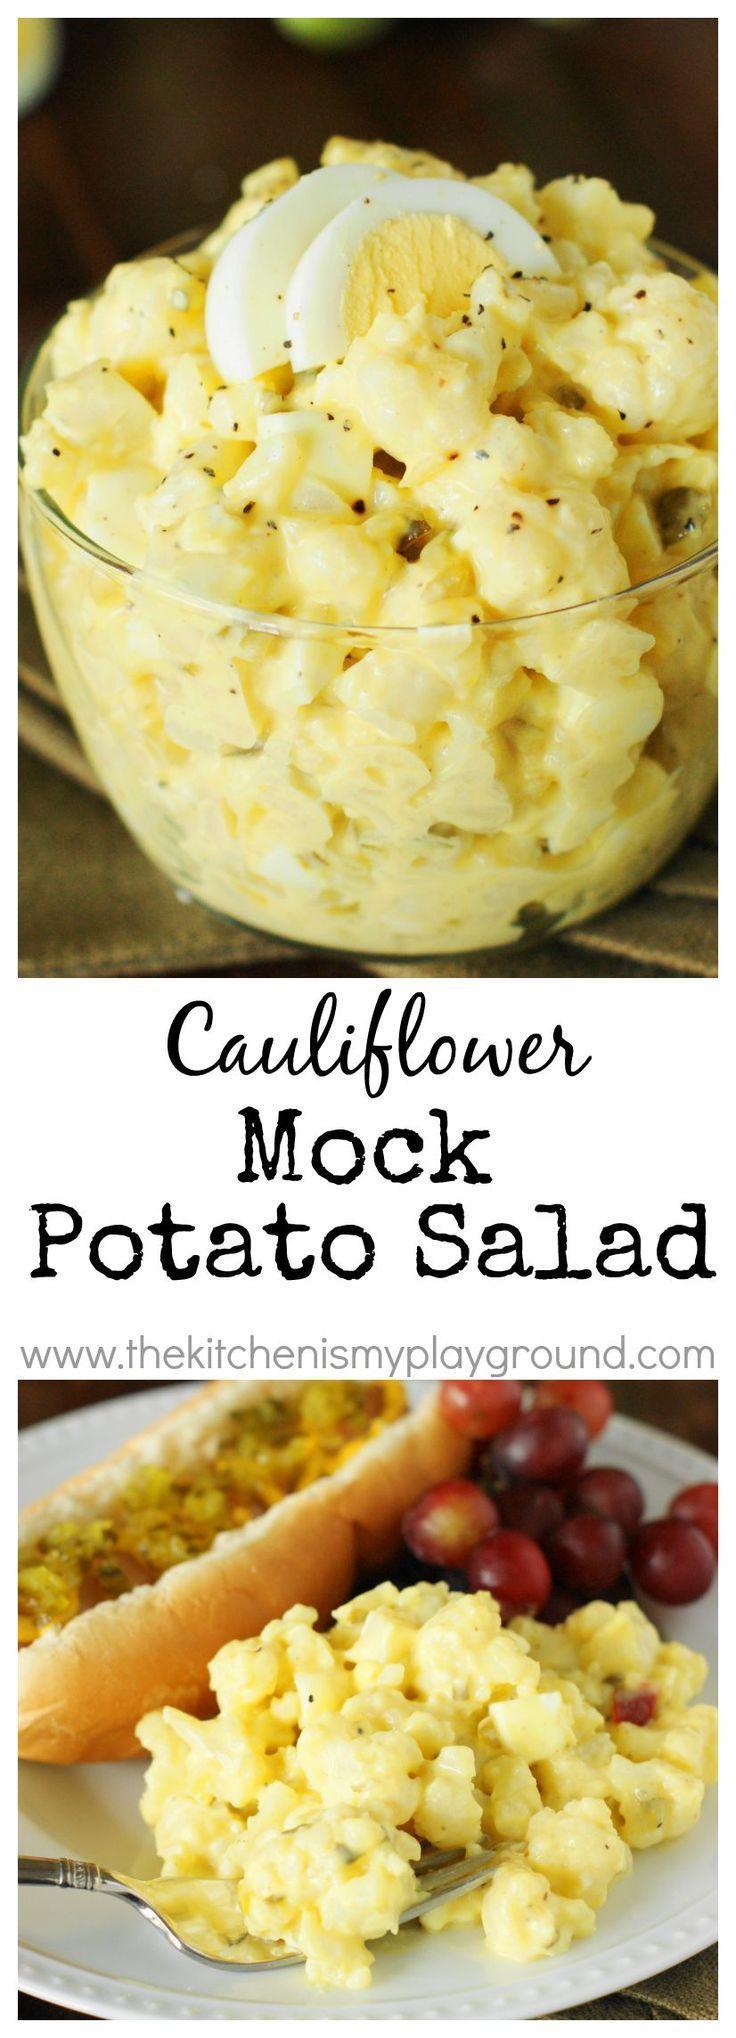 Cauliflower Mock Potato Salad ~ a full-of-flavor lower-carb version of our beloved potato salad!   www.thekitchenism…